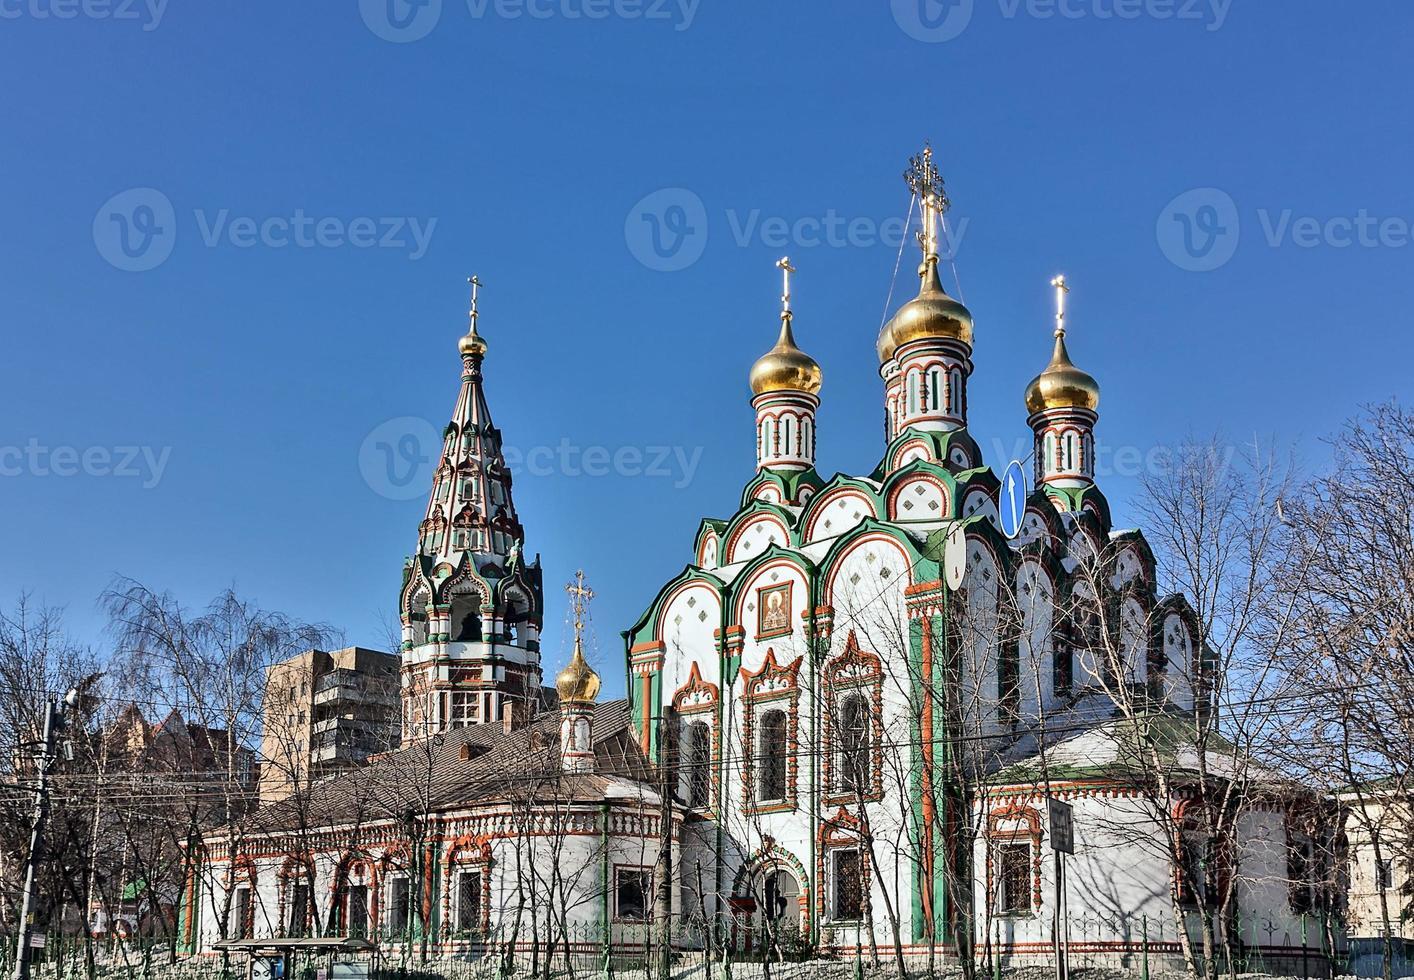 Church of Saint Nicholas in Khamovniki, Moscow, Russia photo